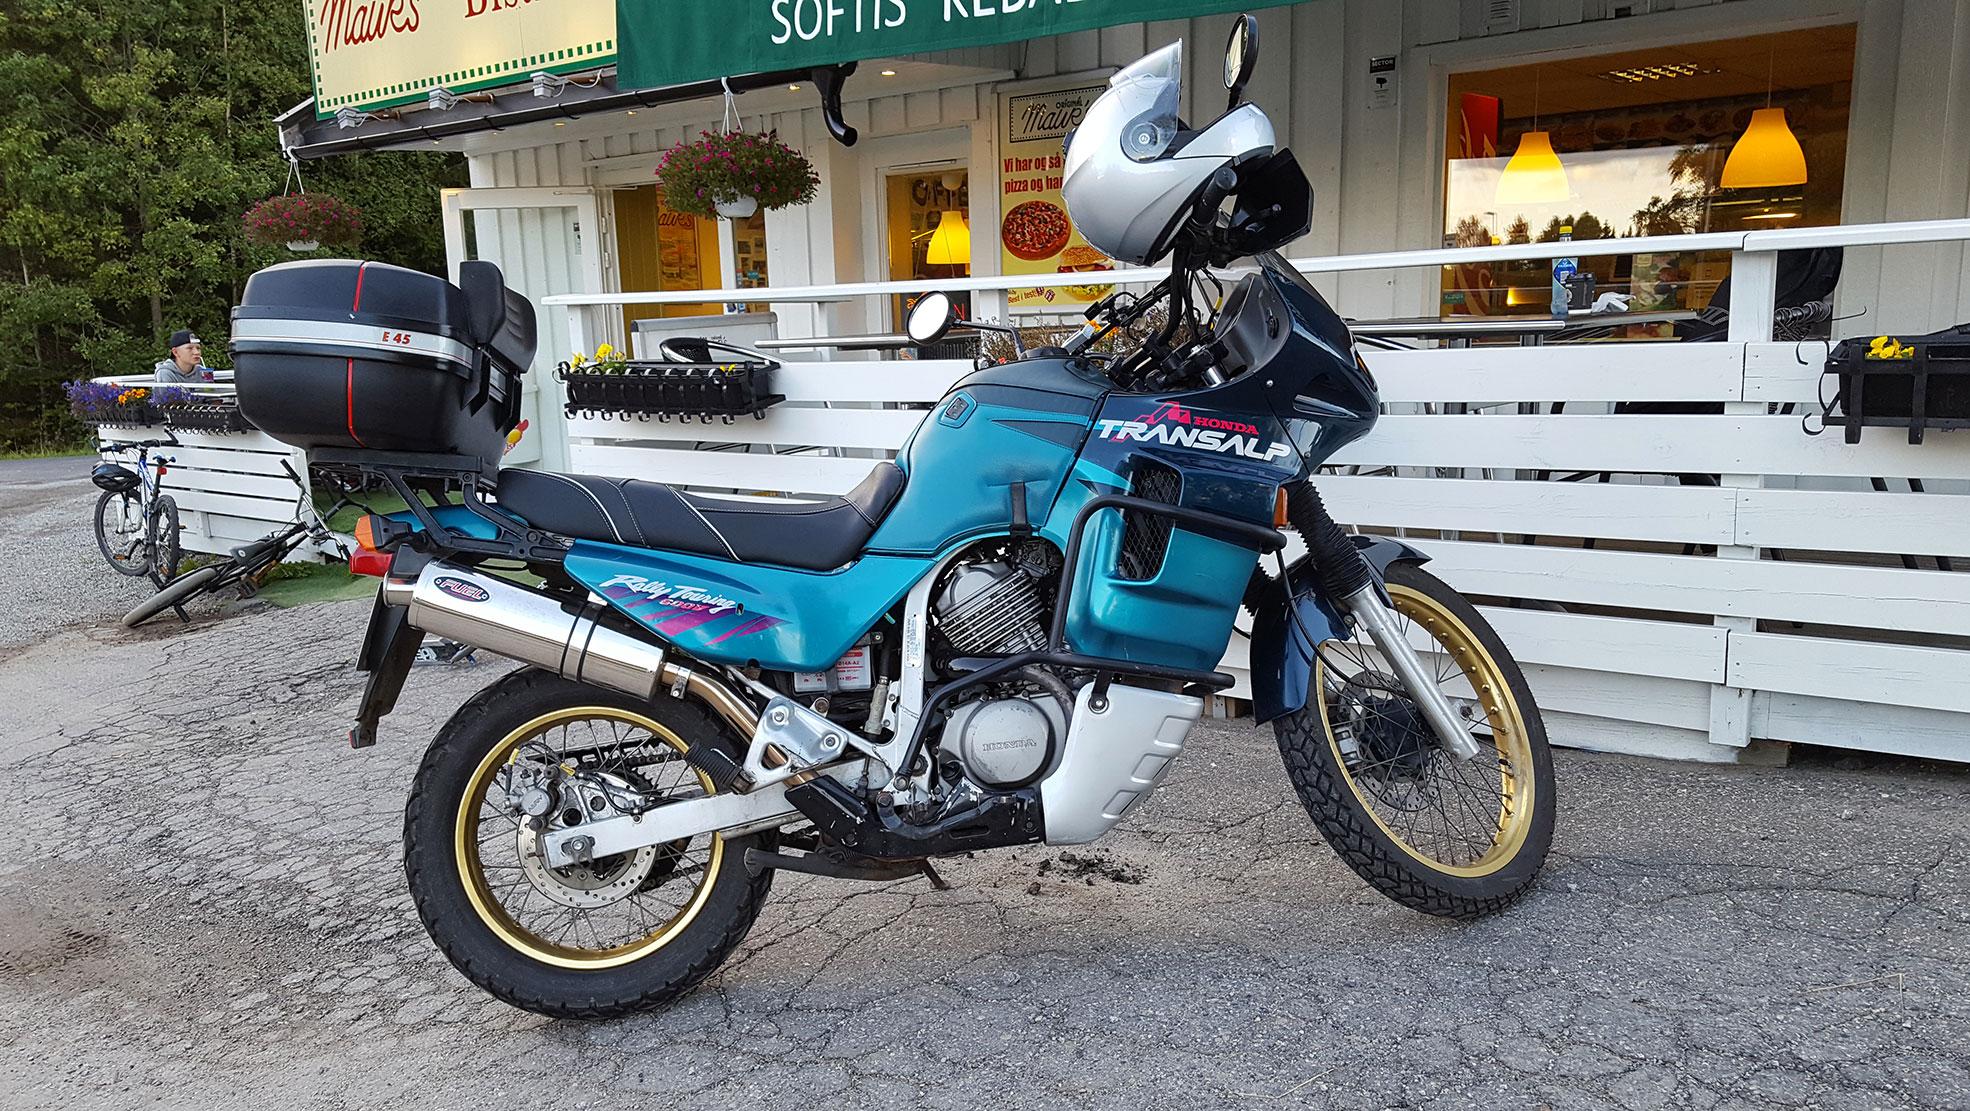 Honda XL600V TransAlp -94 picture